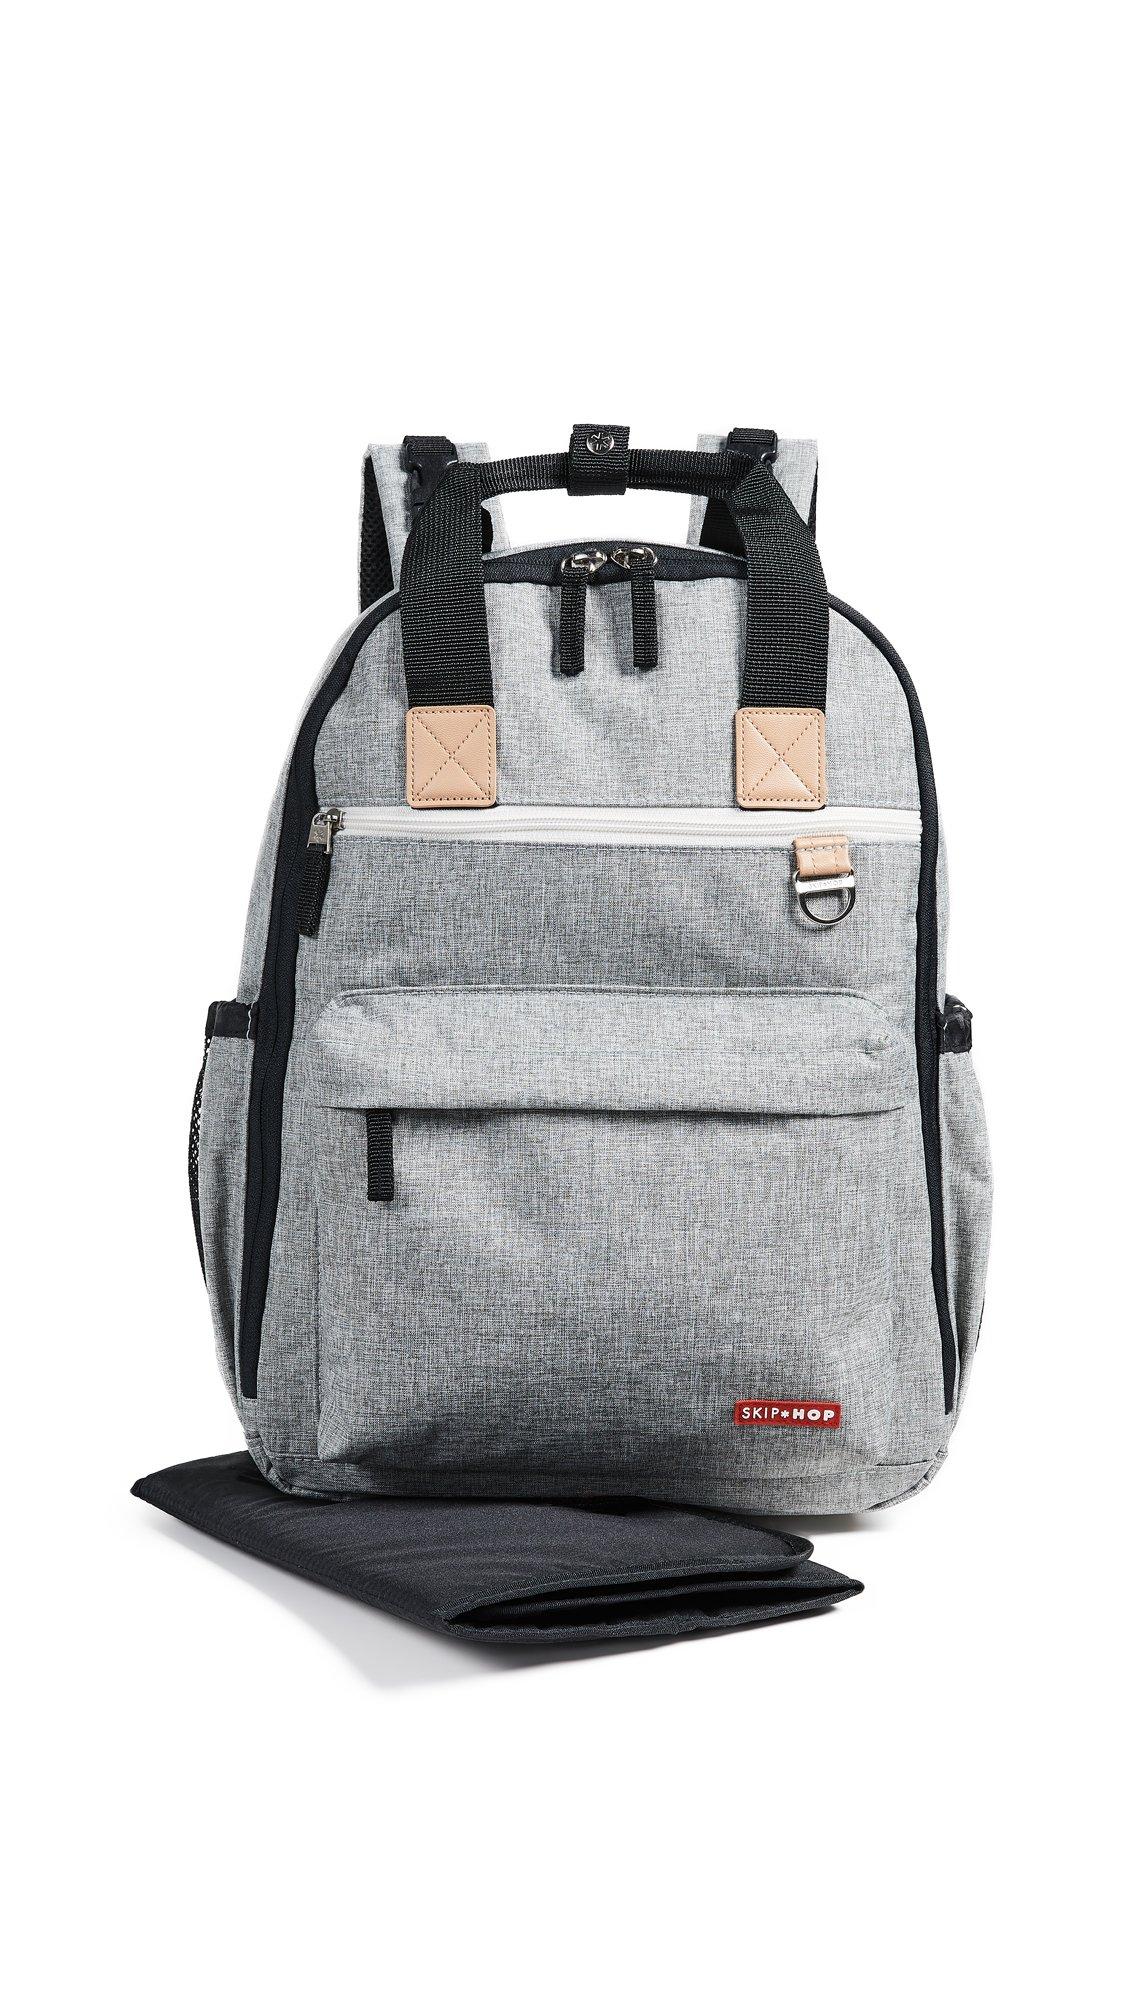 5ddda7b20c13 Eddie Bauer Sport Backpack Diaper Bag